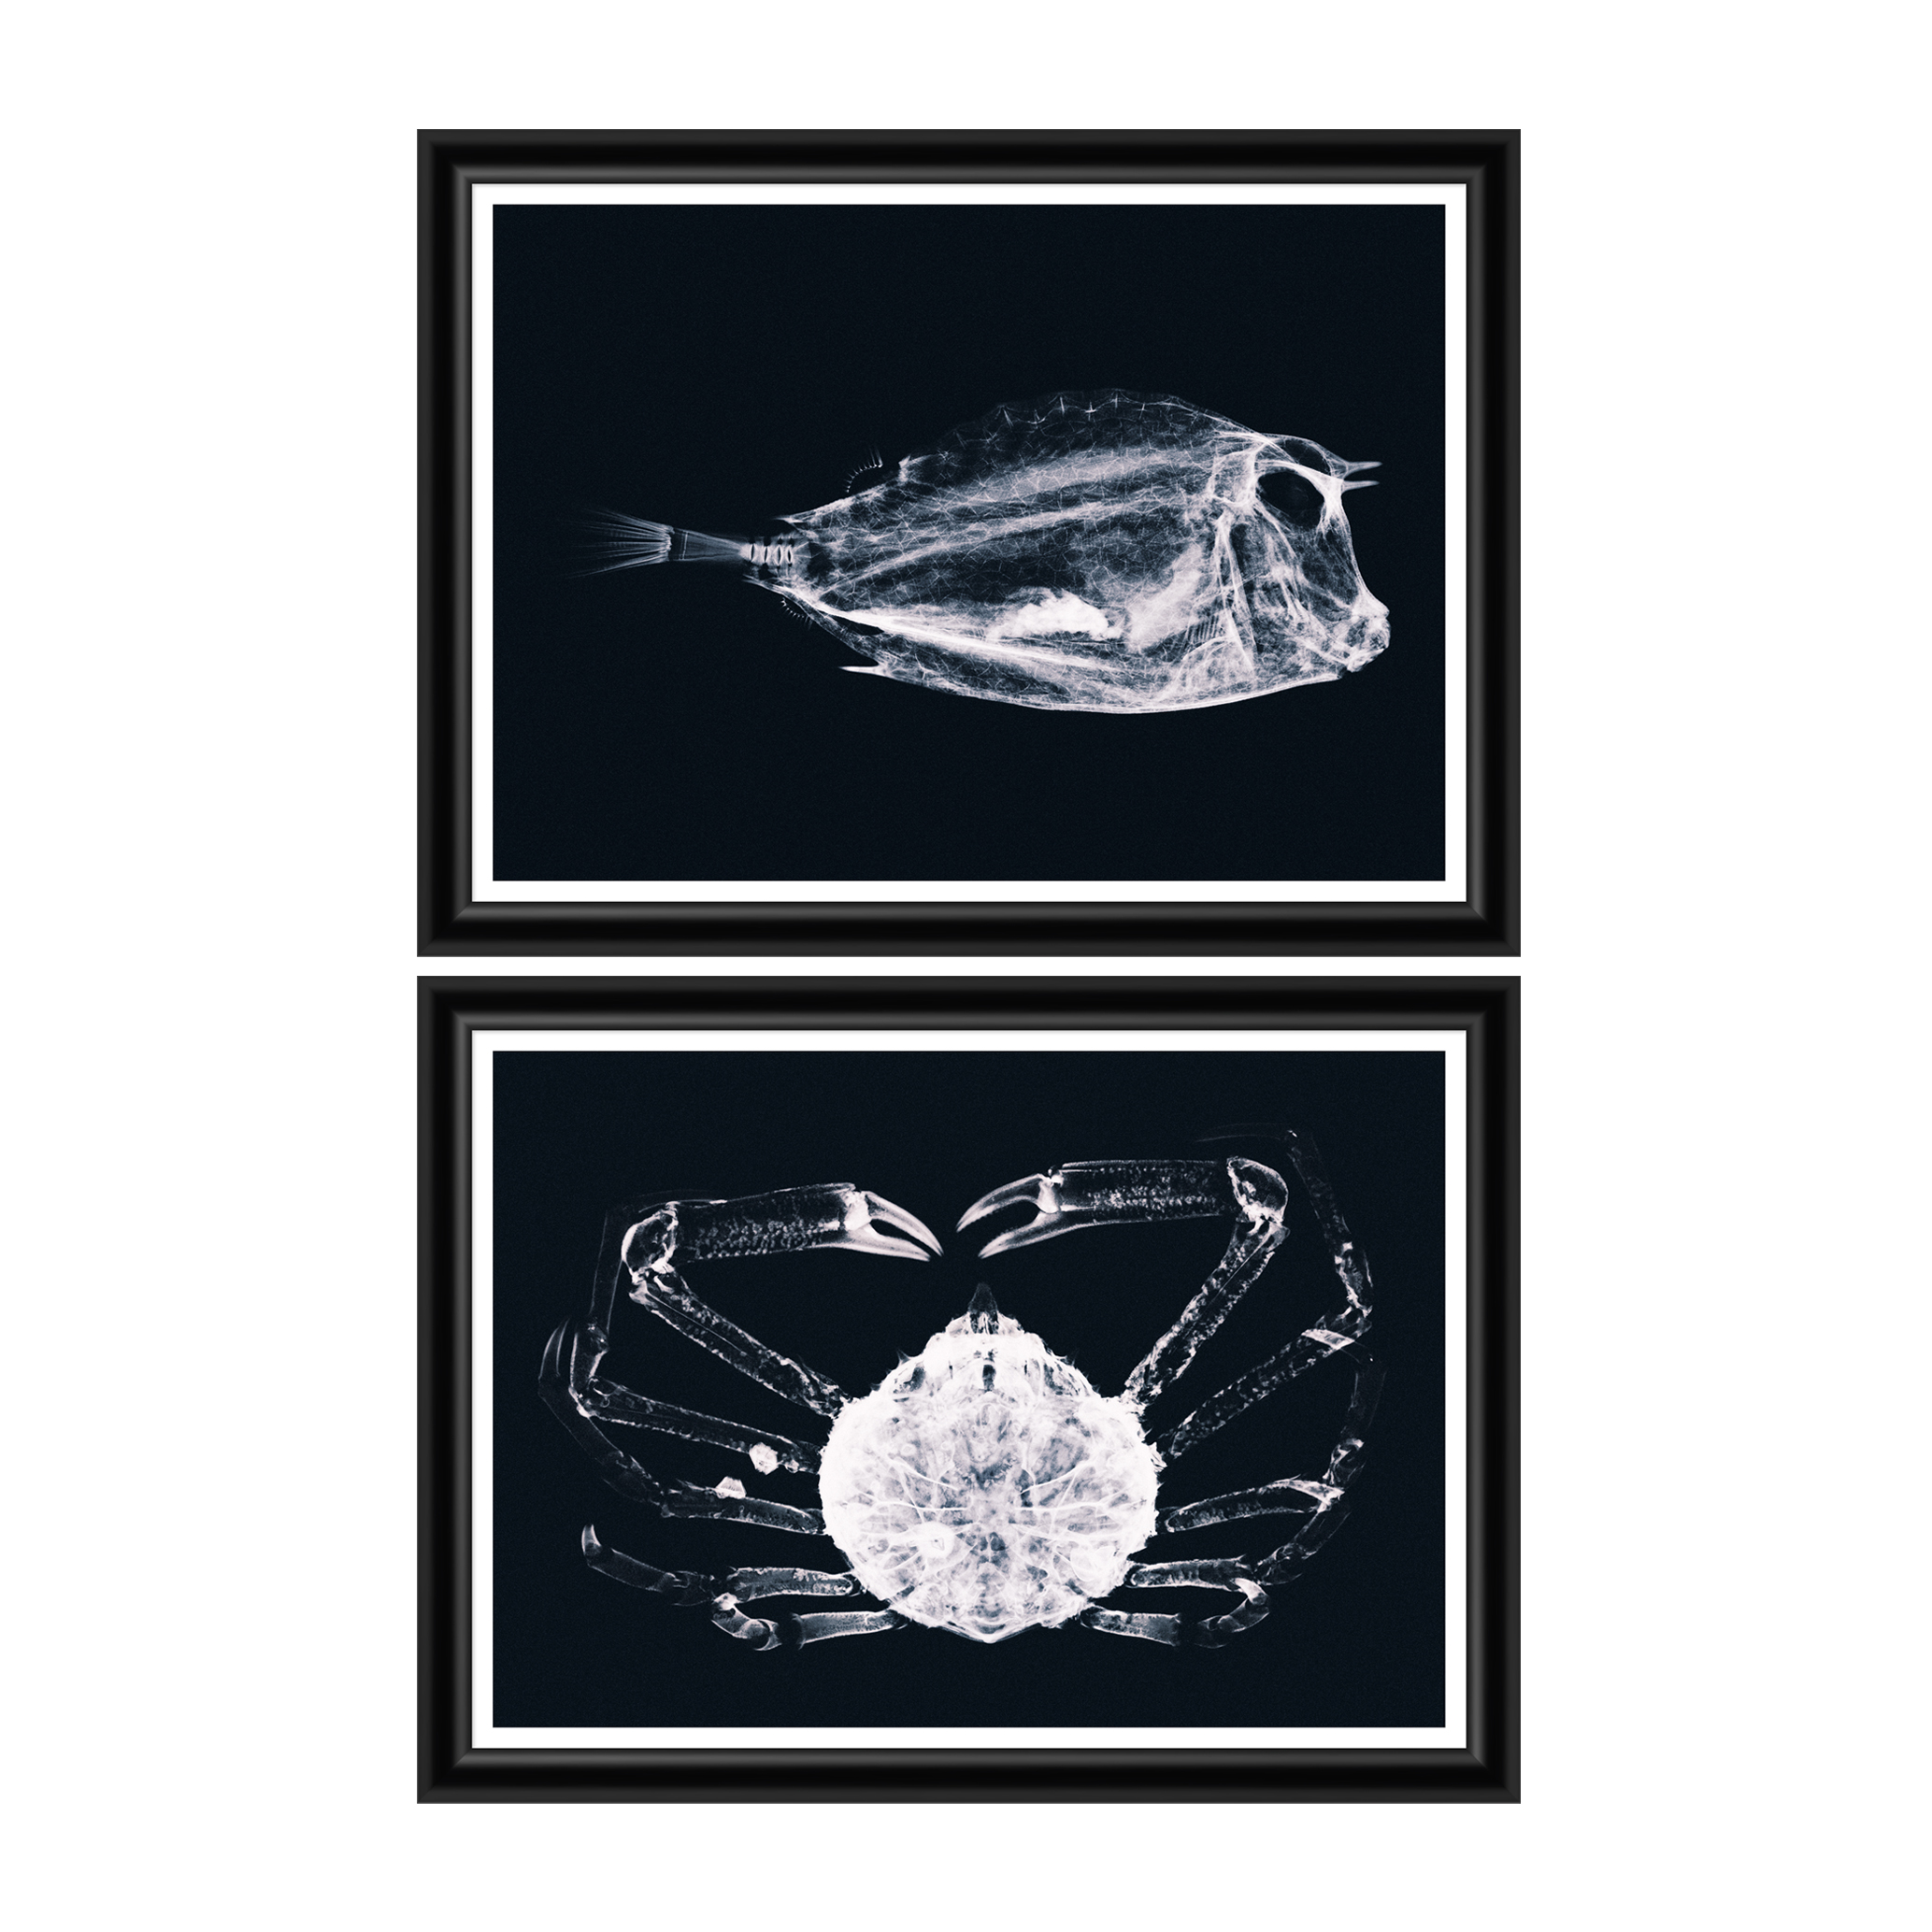 Tablou 2 piese Framed Art X Ray Ocean Species din categoria Tablouri Inramate